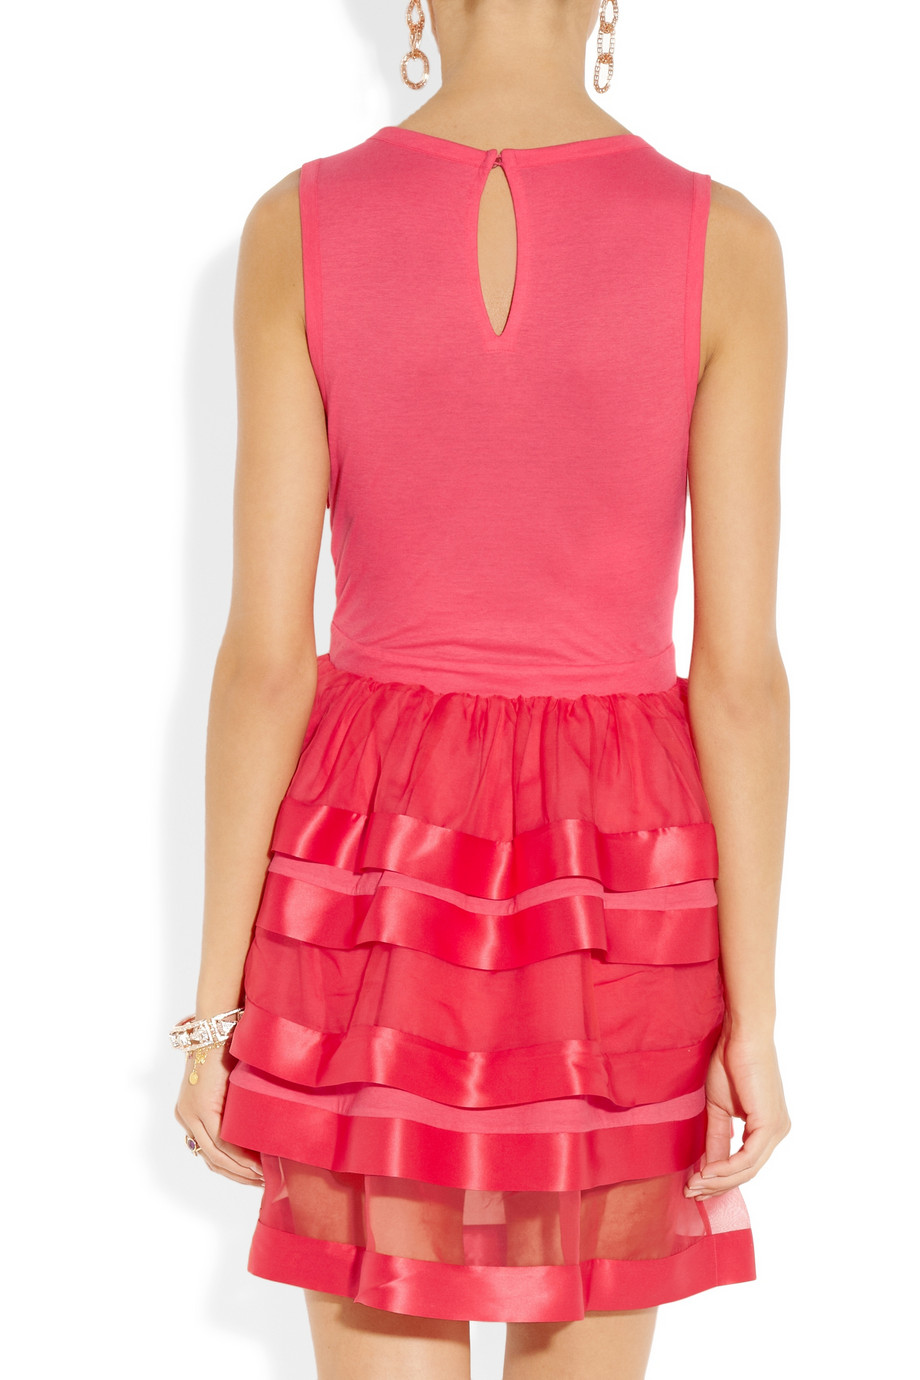 Lyst Miu Miu Ruffled Cottonjersey And Silkorganza Dress